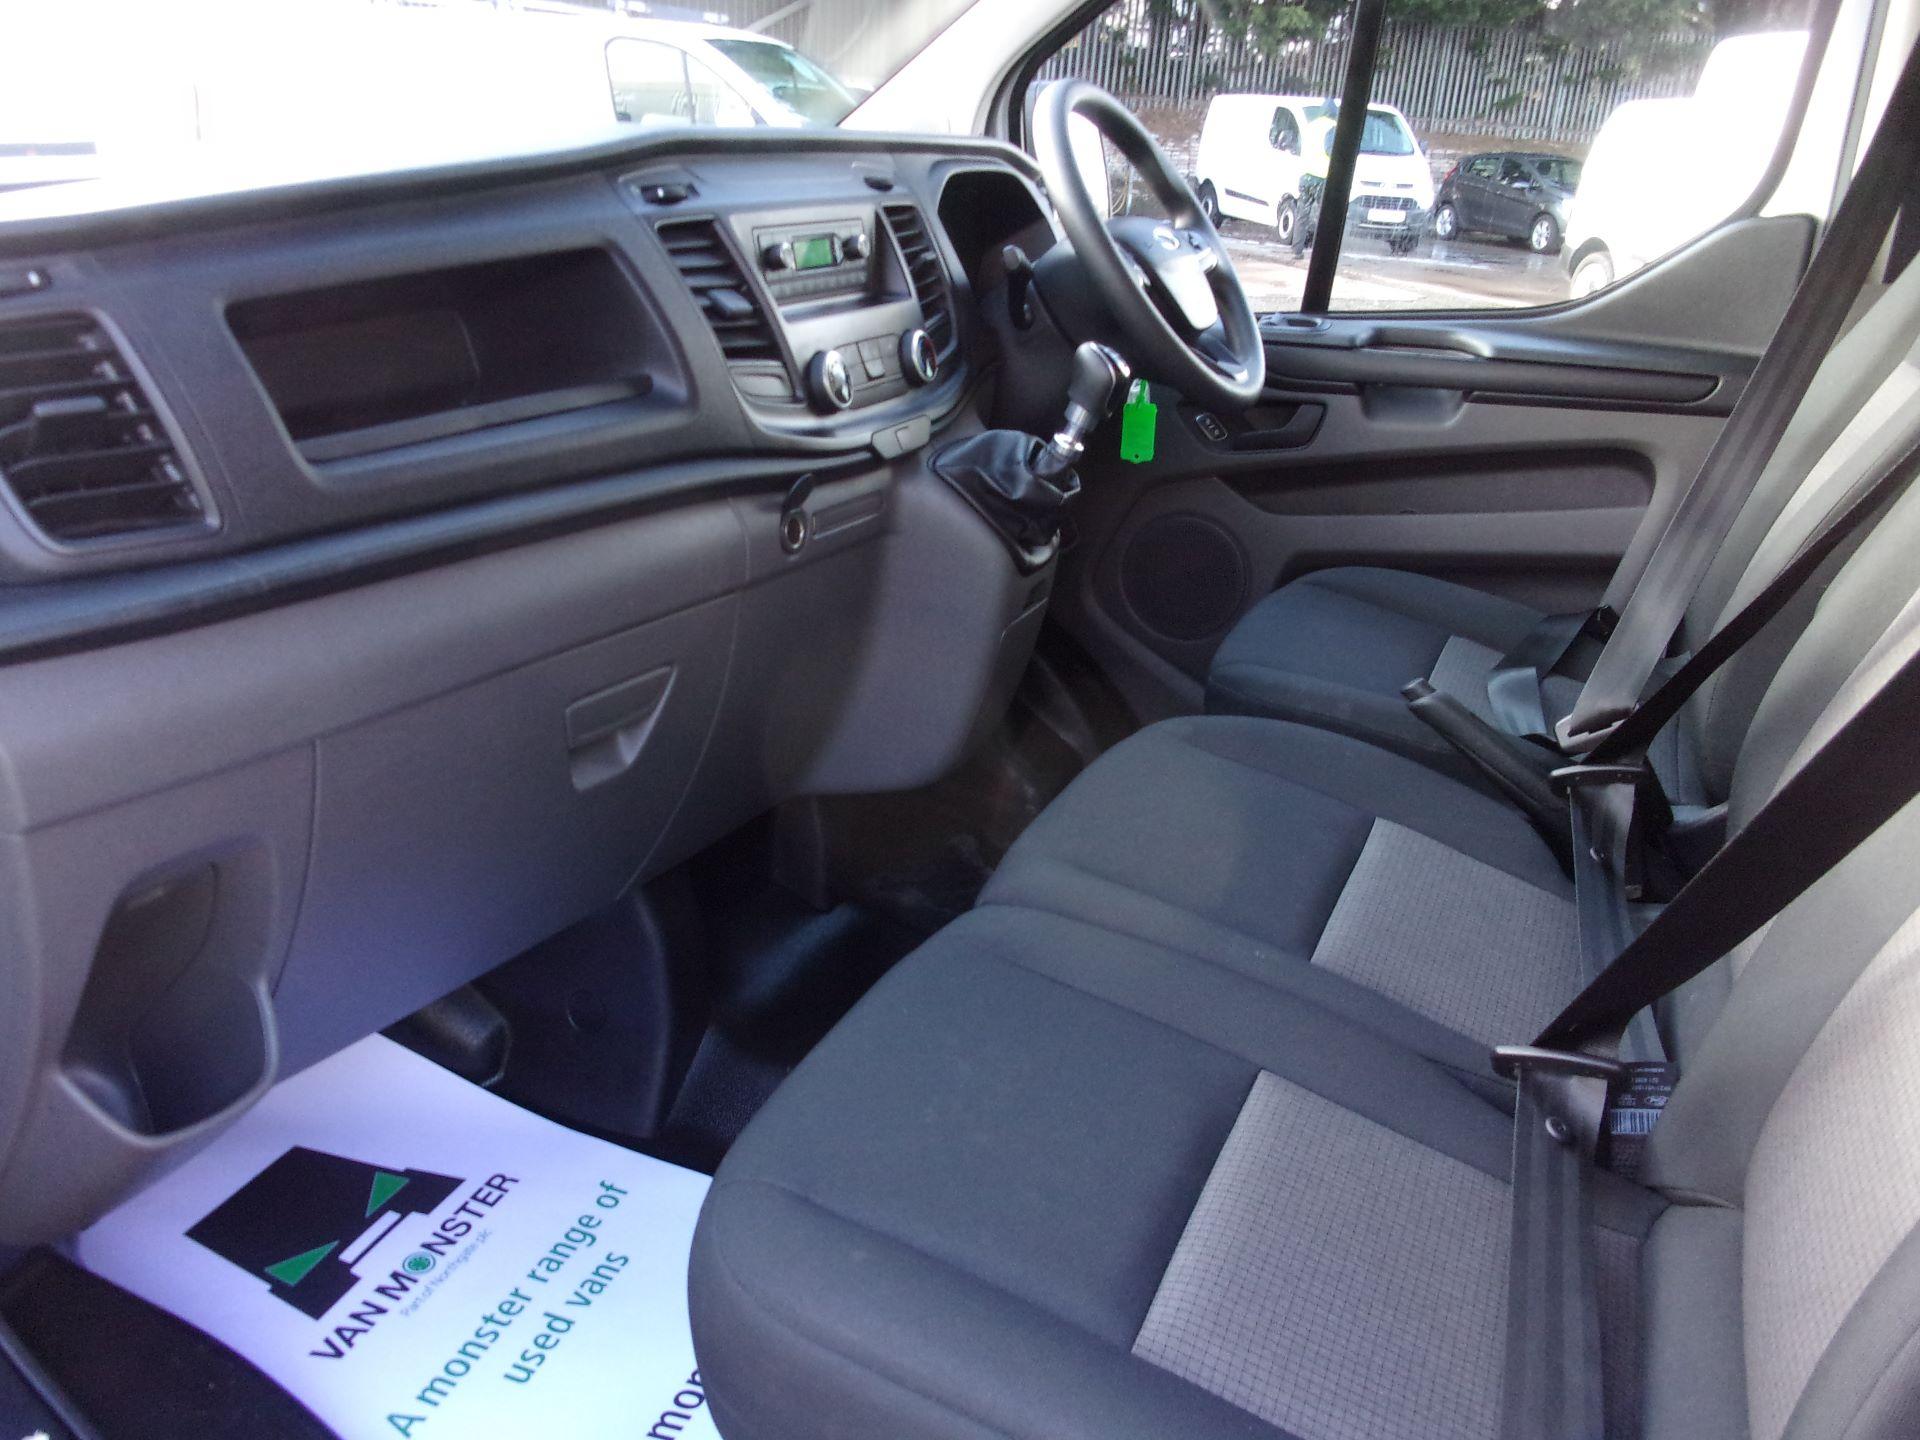 2018 Ford Transit Custom 300 L1 DIESEL FWD 2.0 TDCI 105PS LOW ROOF VAN EURO 6 (FD18VZC) Image 13